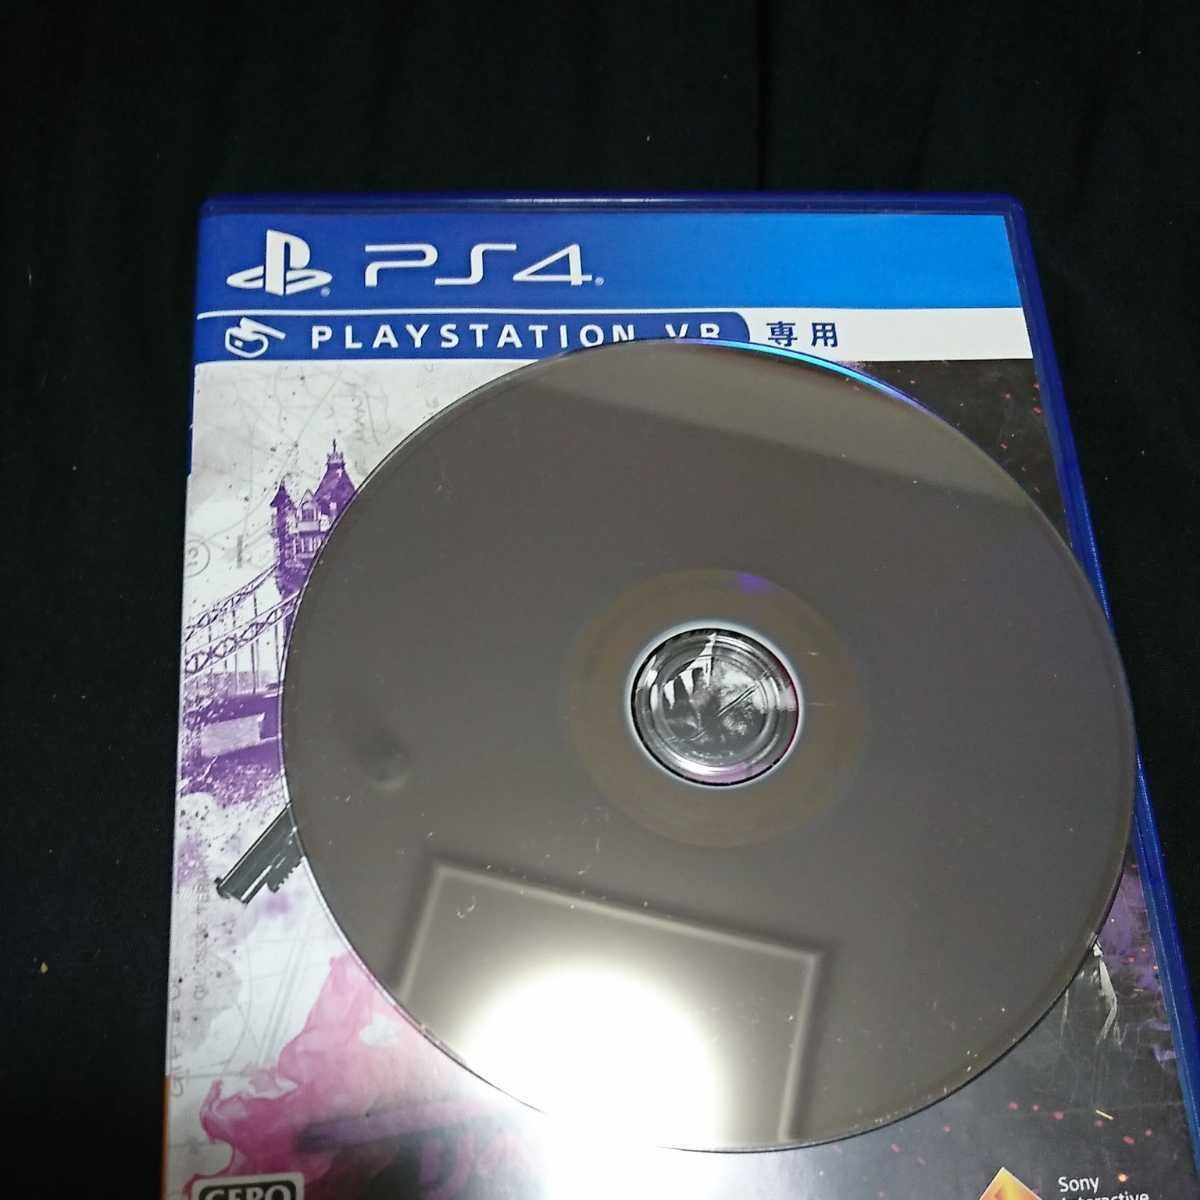 PS4 ライアンマークス リベンジミッション PS4ソフト